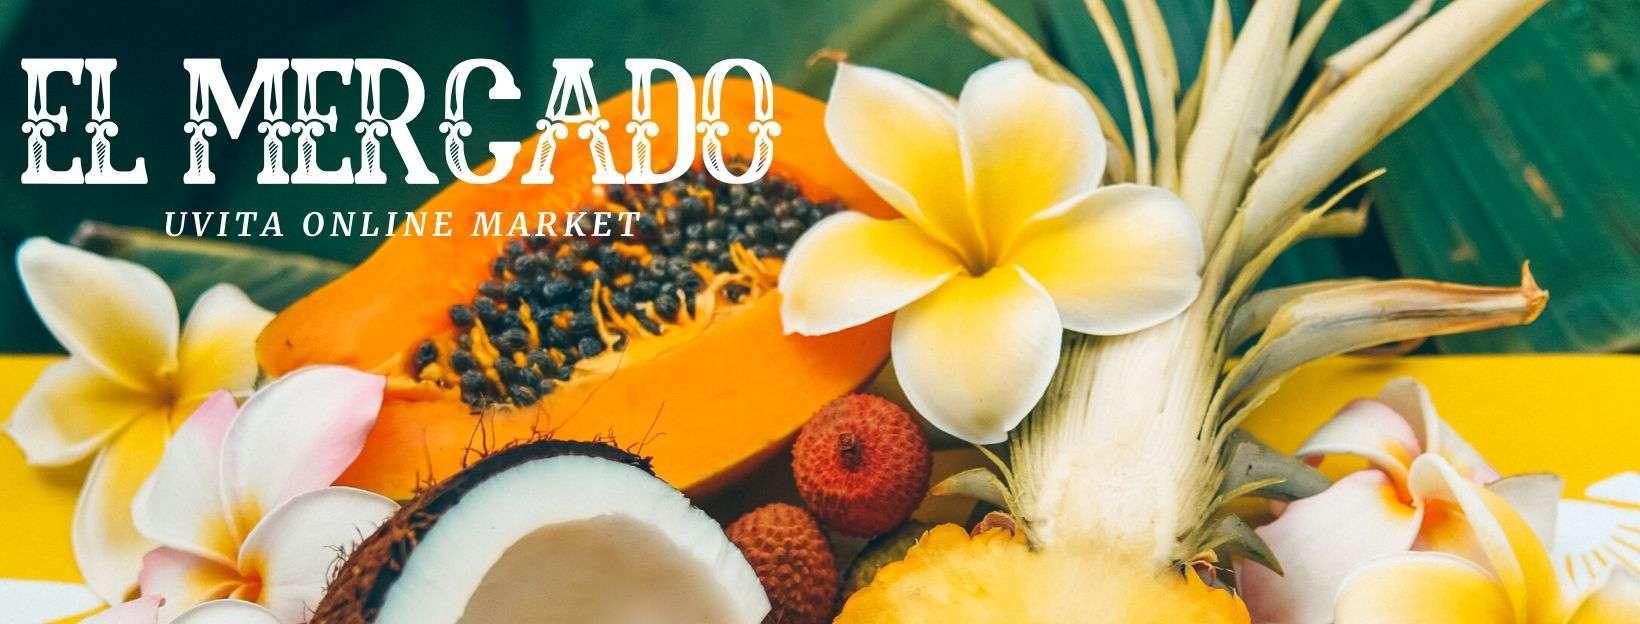 El Mercado, a Virtual Market supporting rural entrepreneurship